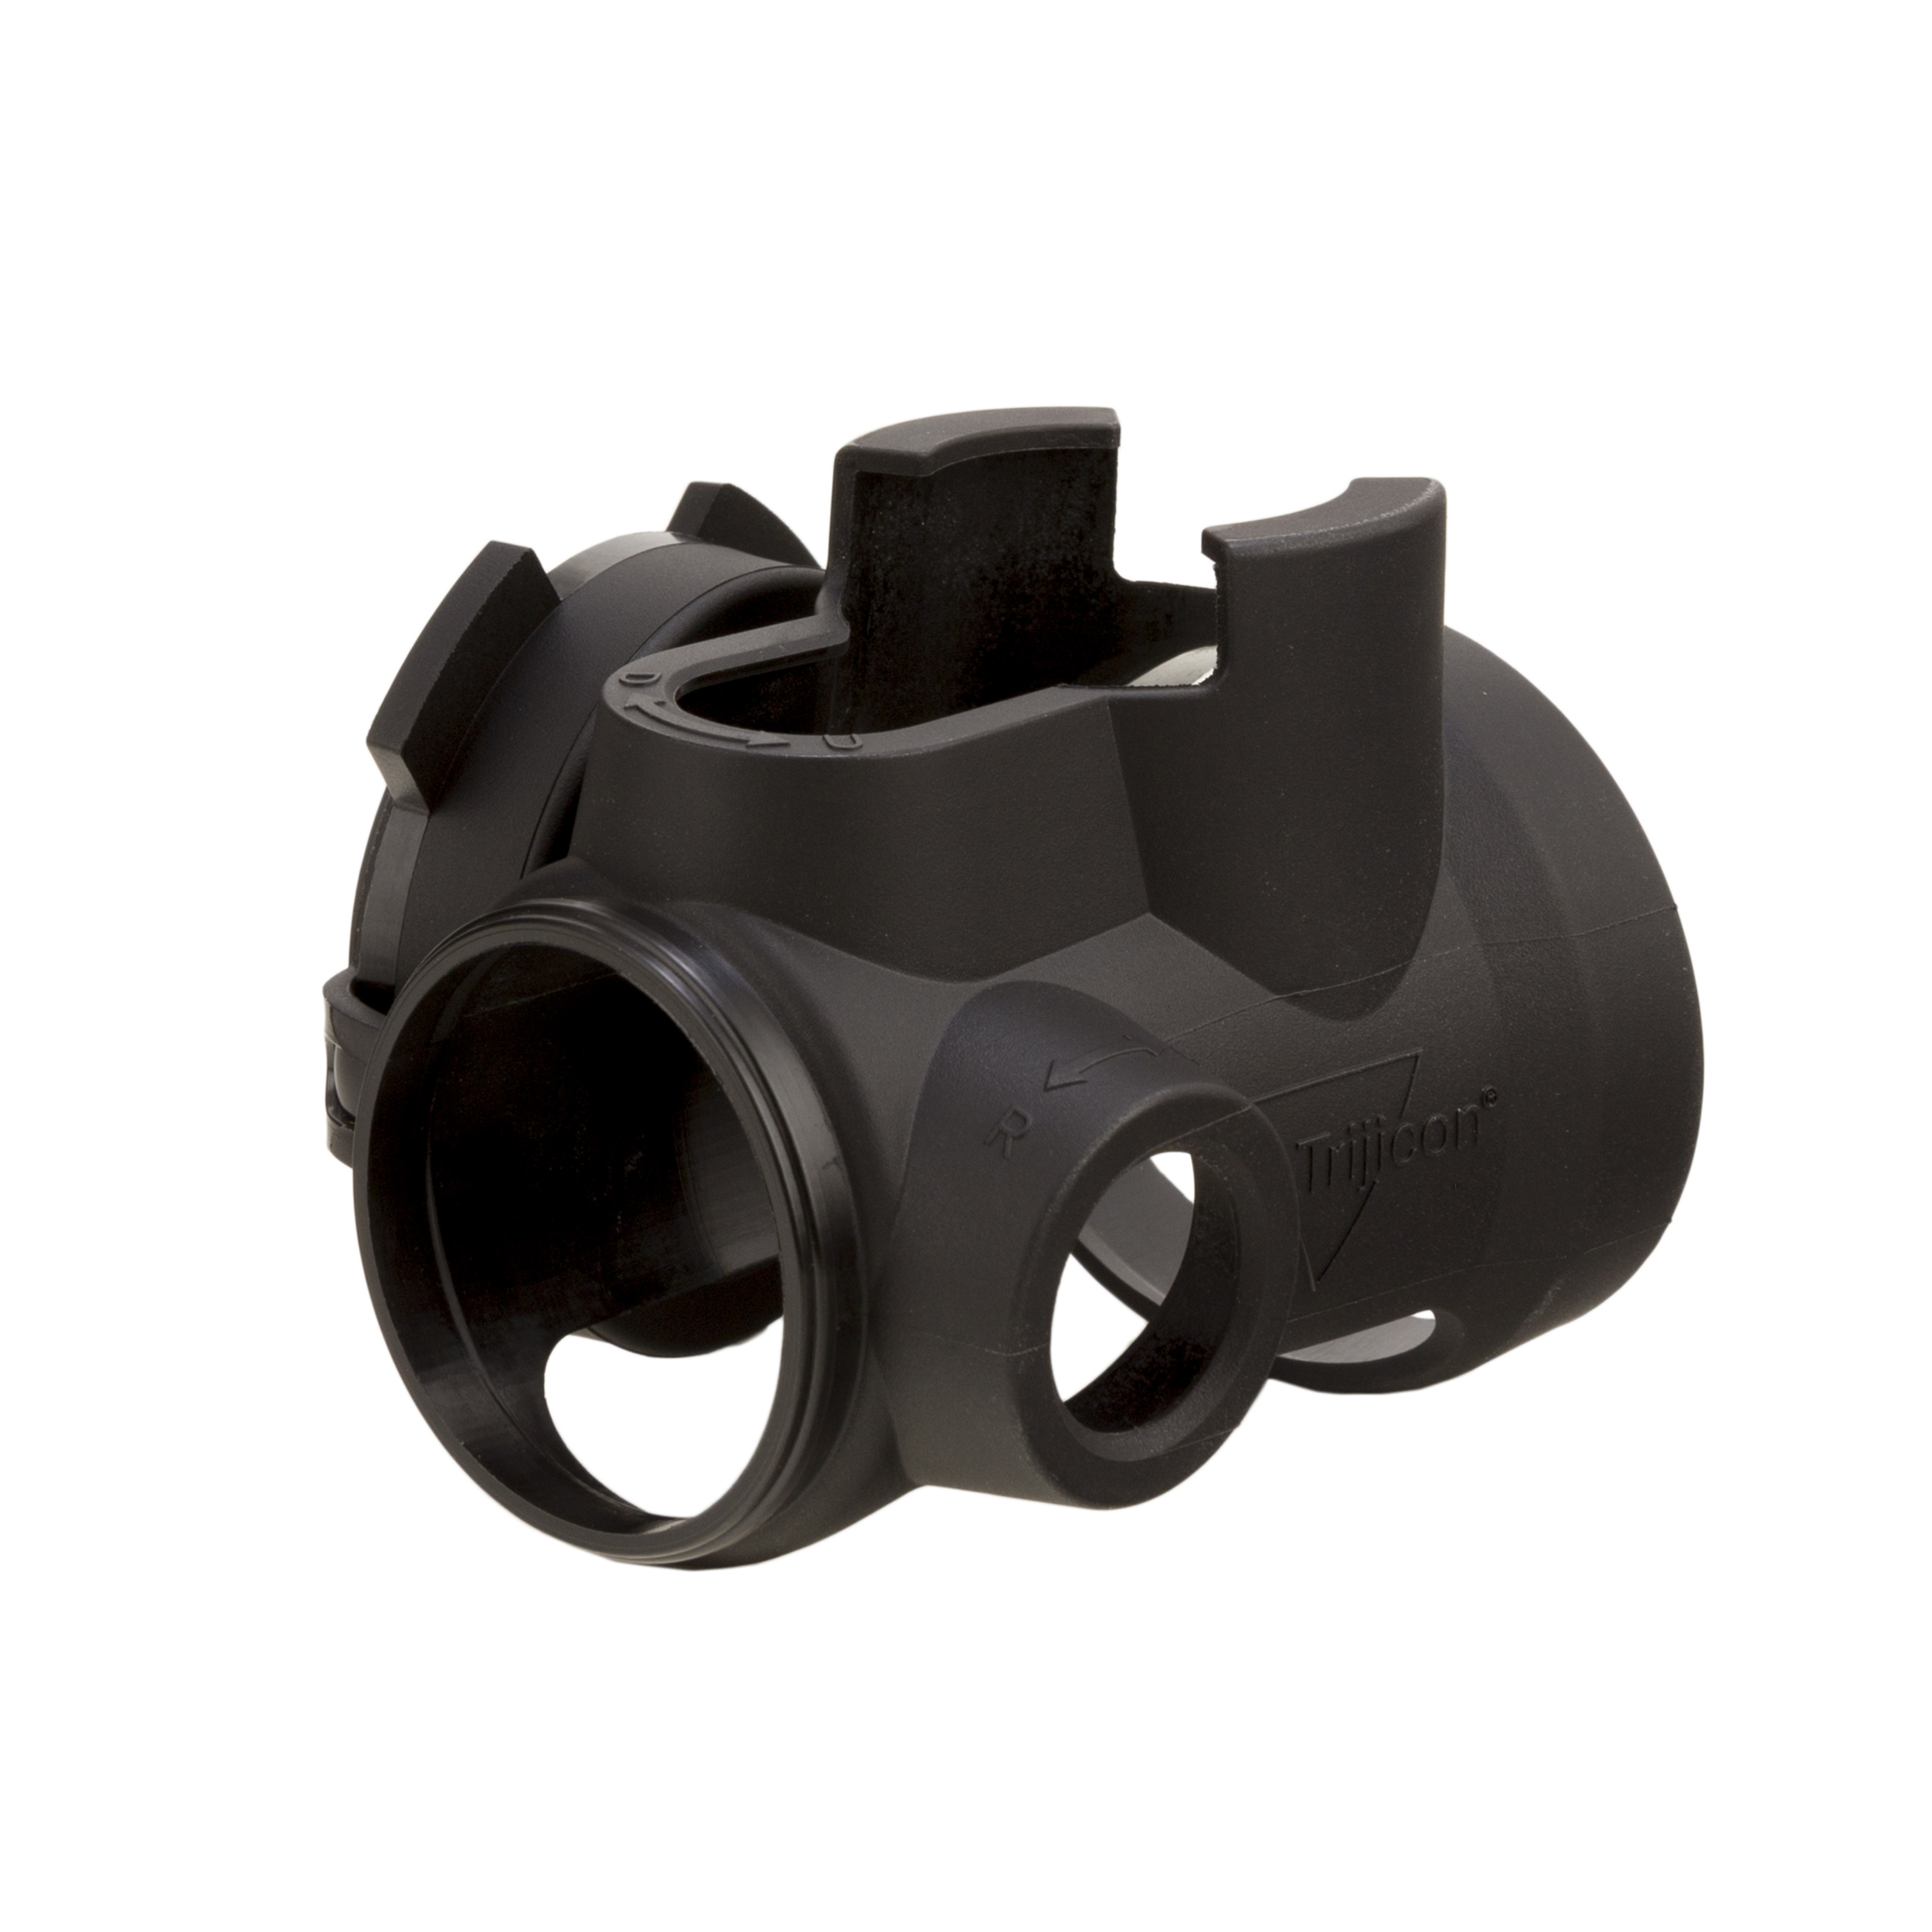 Trijicon MRO Slip-On Protective Cover w/ Clear Lens Caps (Black) - AC31021